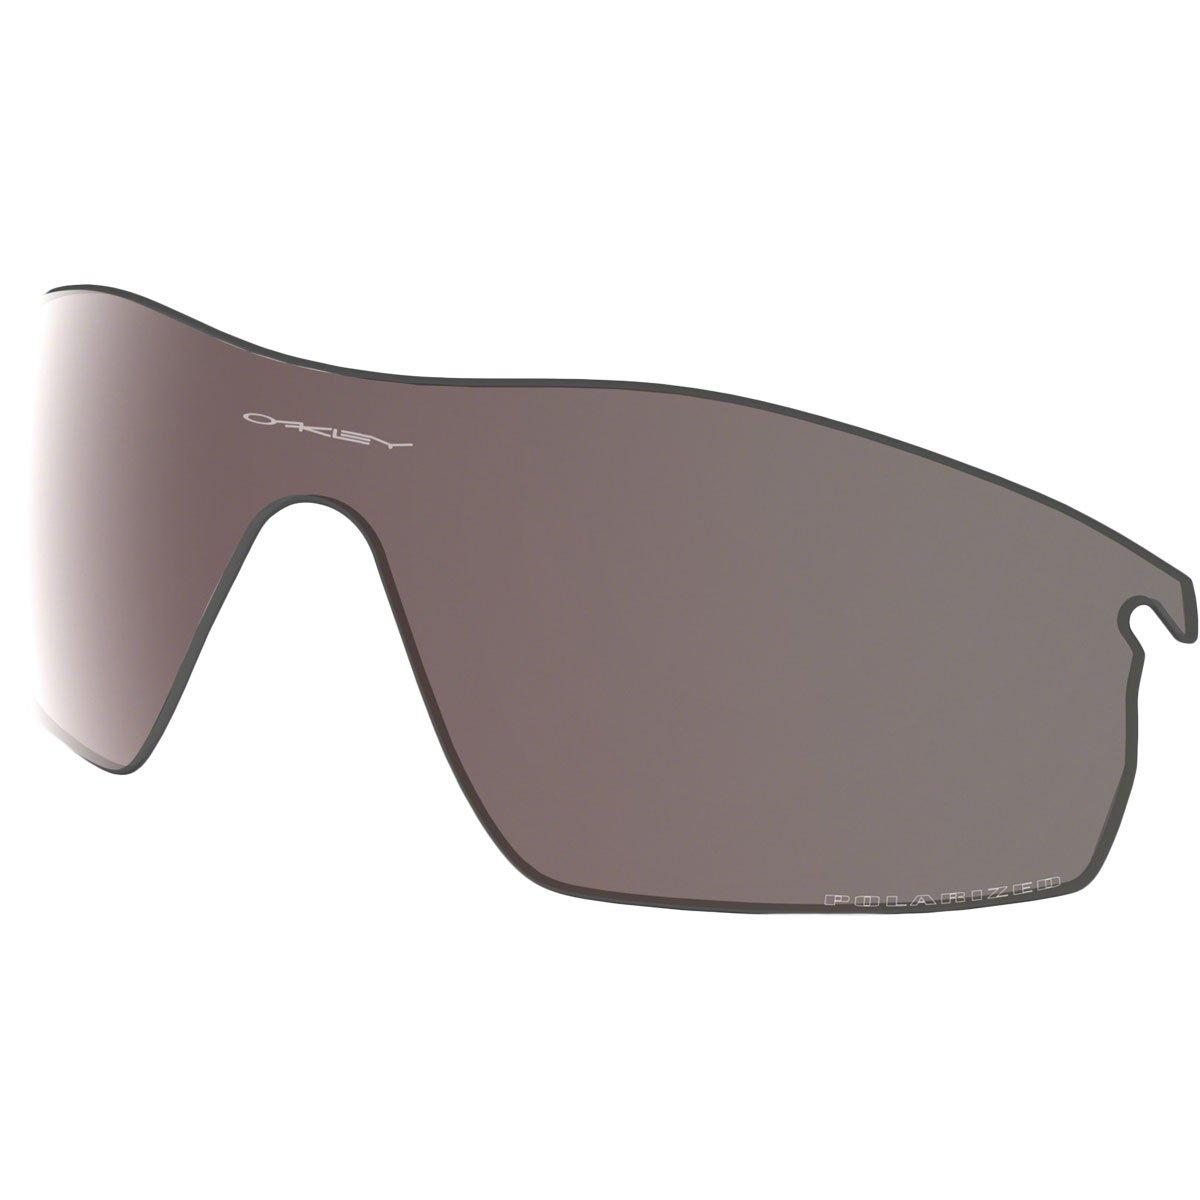 678b5eceab Oakley RadarLock Pitch Replacement Lens at Amazon Men s Clothing store